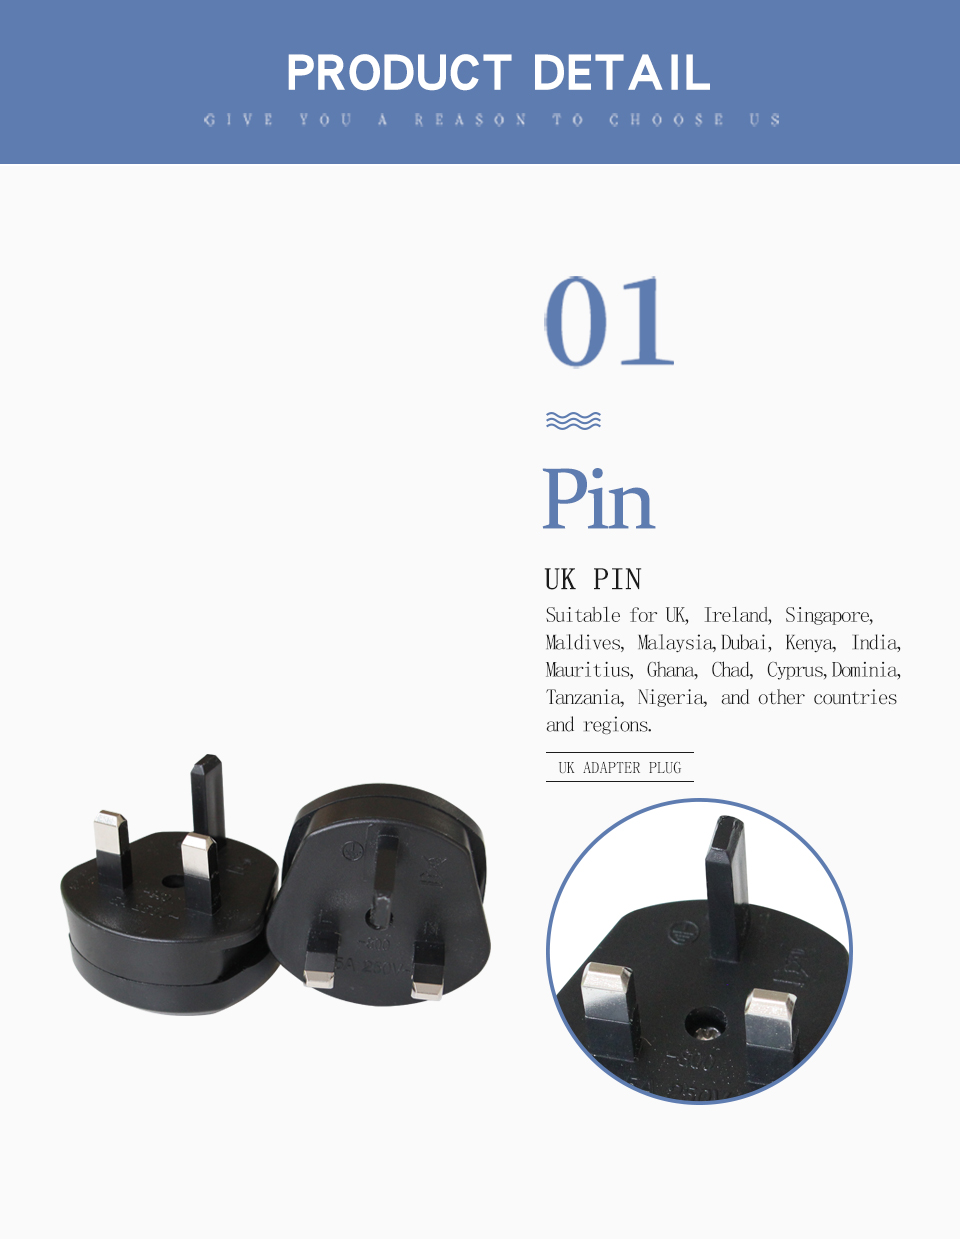 1 PC UK Adapter Travel Wall Power Plug Charger Adaptors Converter Connector uk Plug 3 Pin Socket Singapore Maldives Malaysia (4)